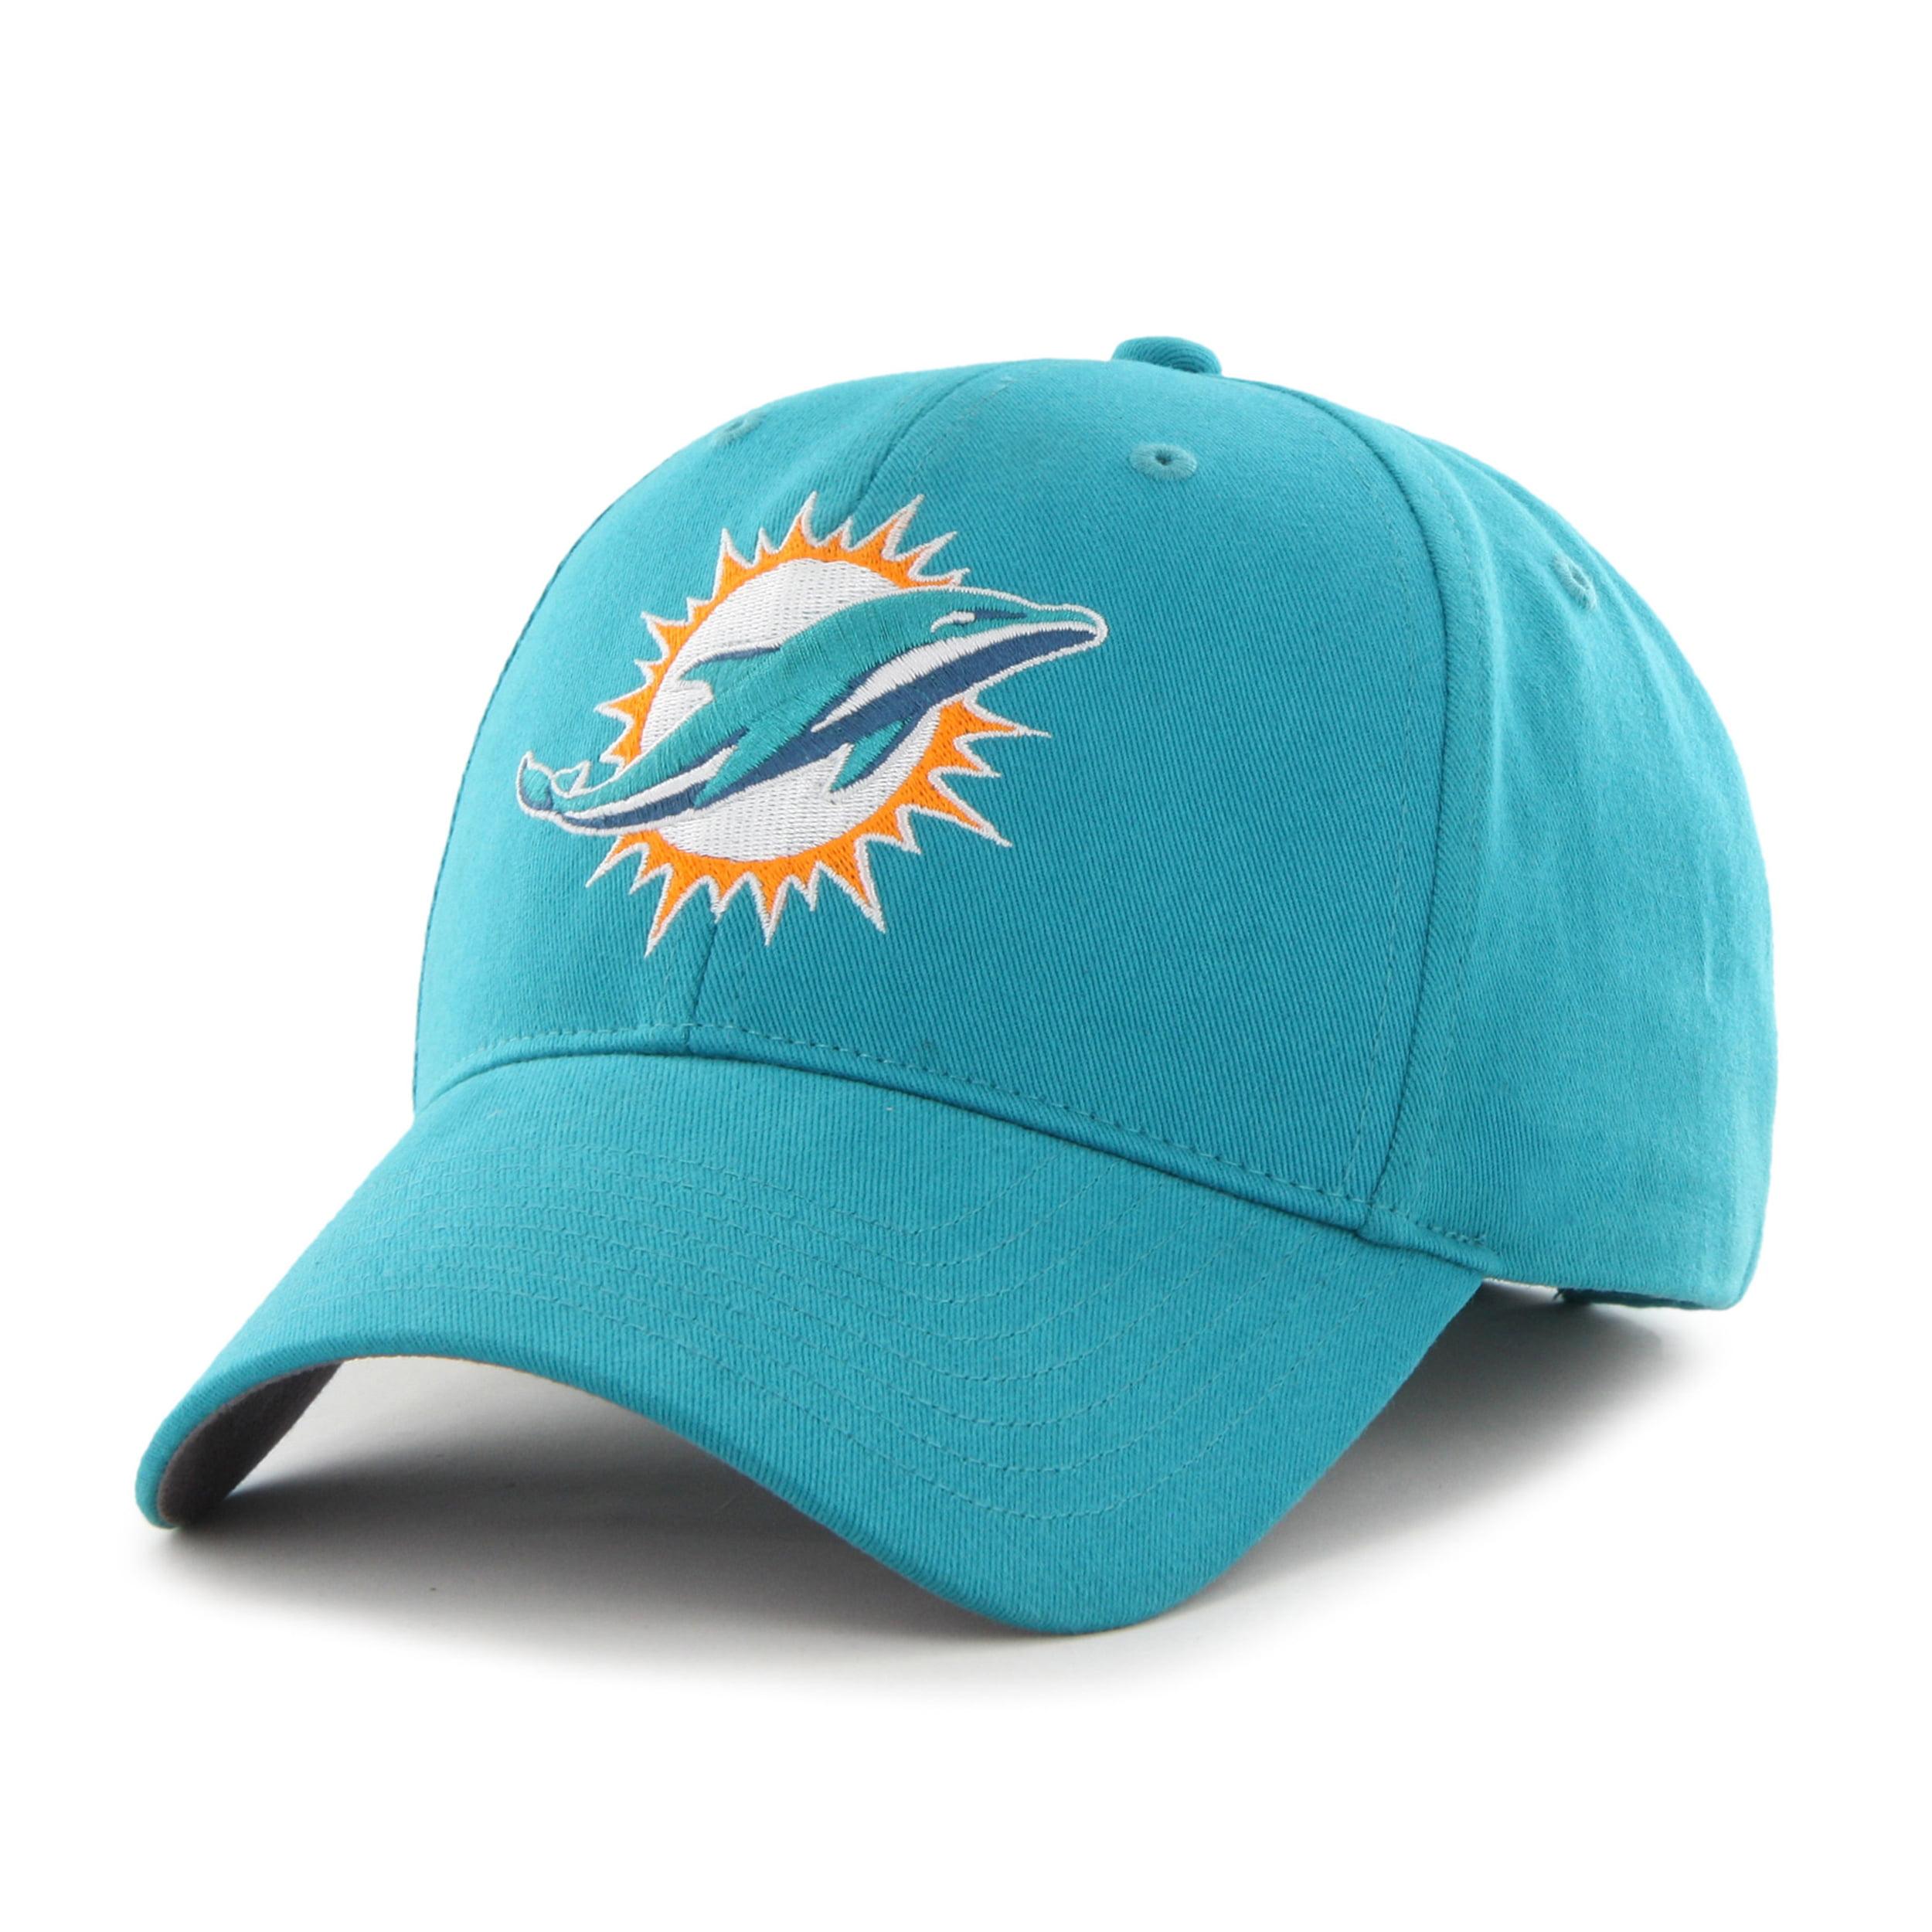 Fan Favorite - NFL Basic Cap, Miami Dolphins